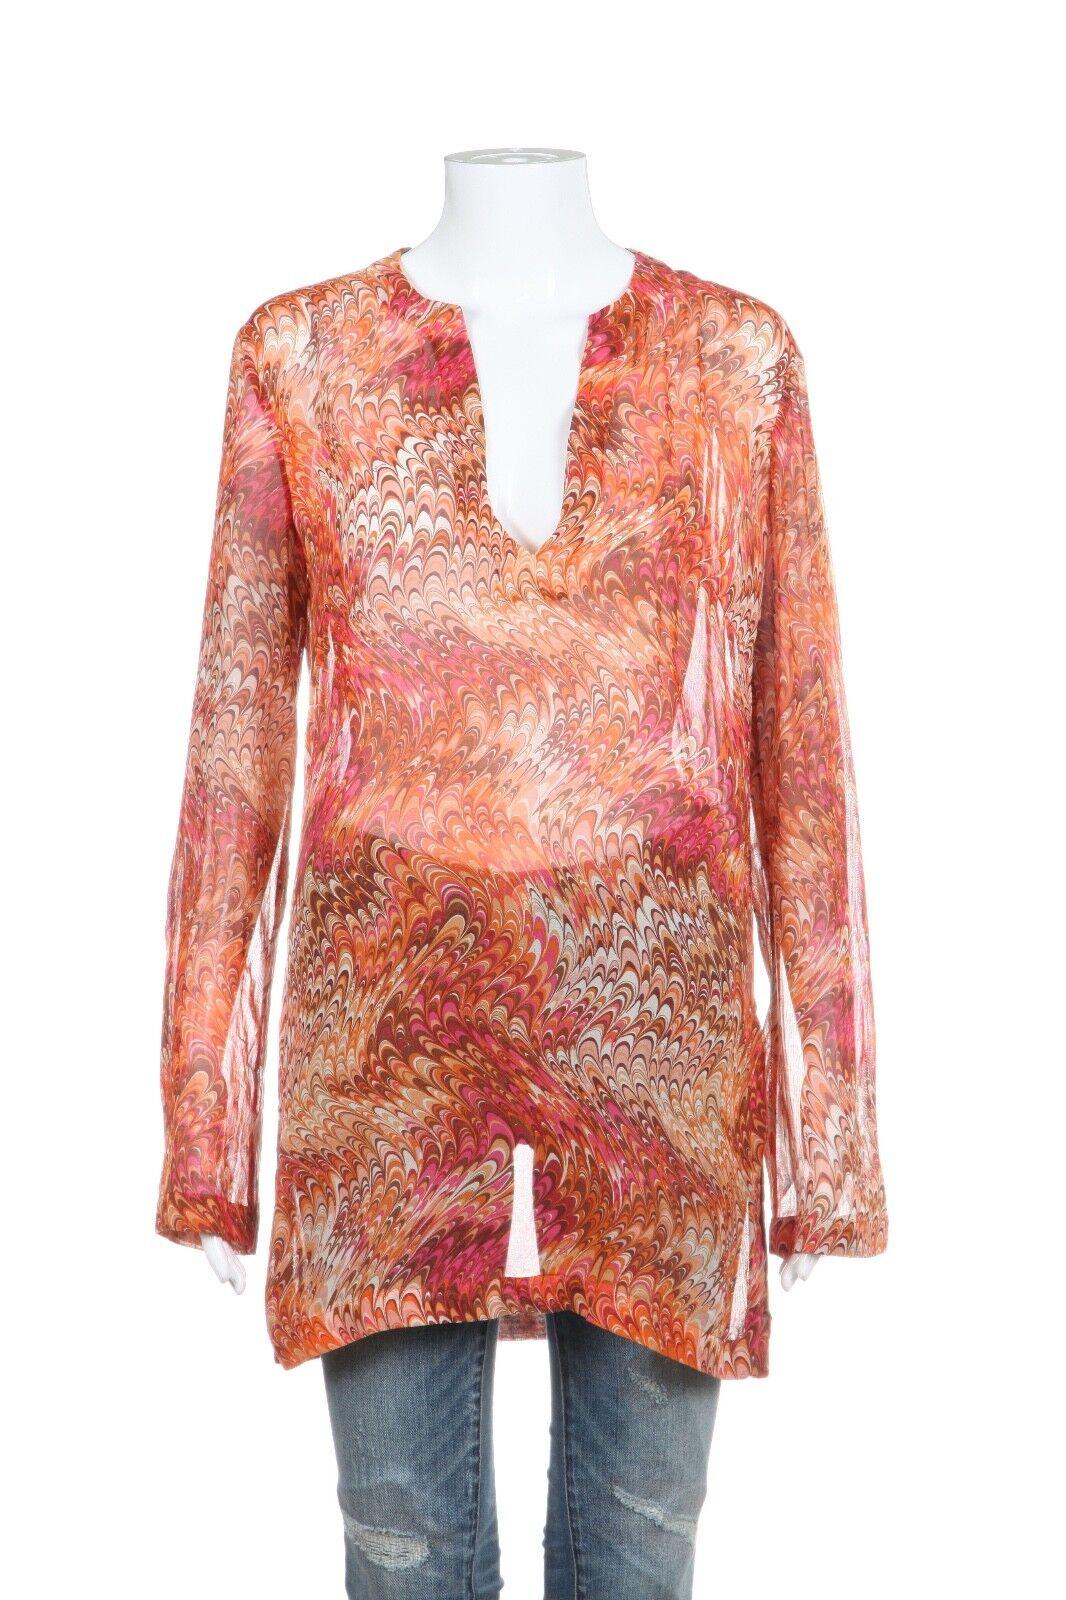 CELINE Tunic Blouse 8 Medium 100% Silk Orange Rosa Sheer Shirt Long Sleeve Top